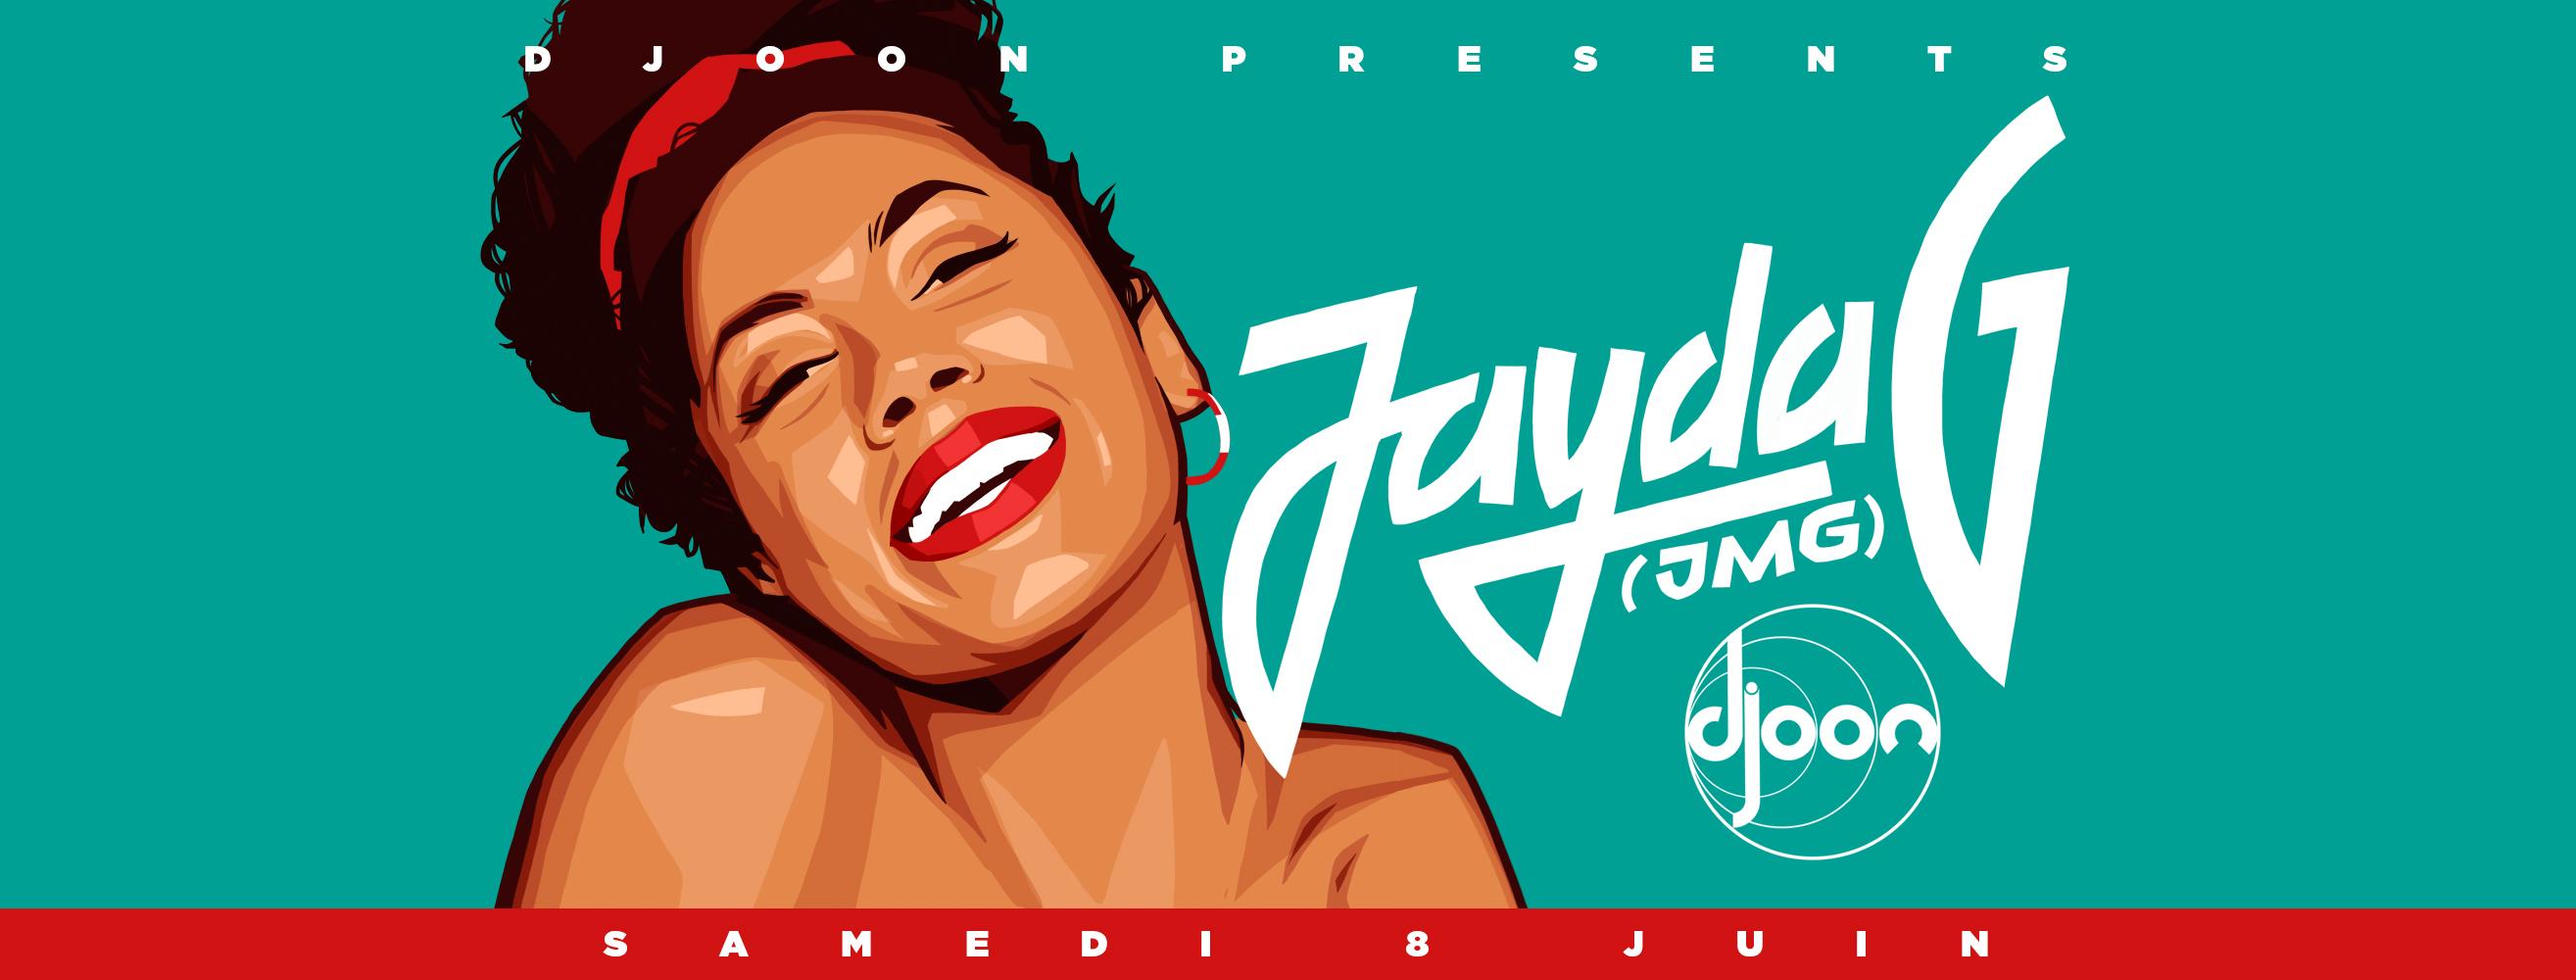 Djoon invites Jayda G